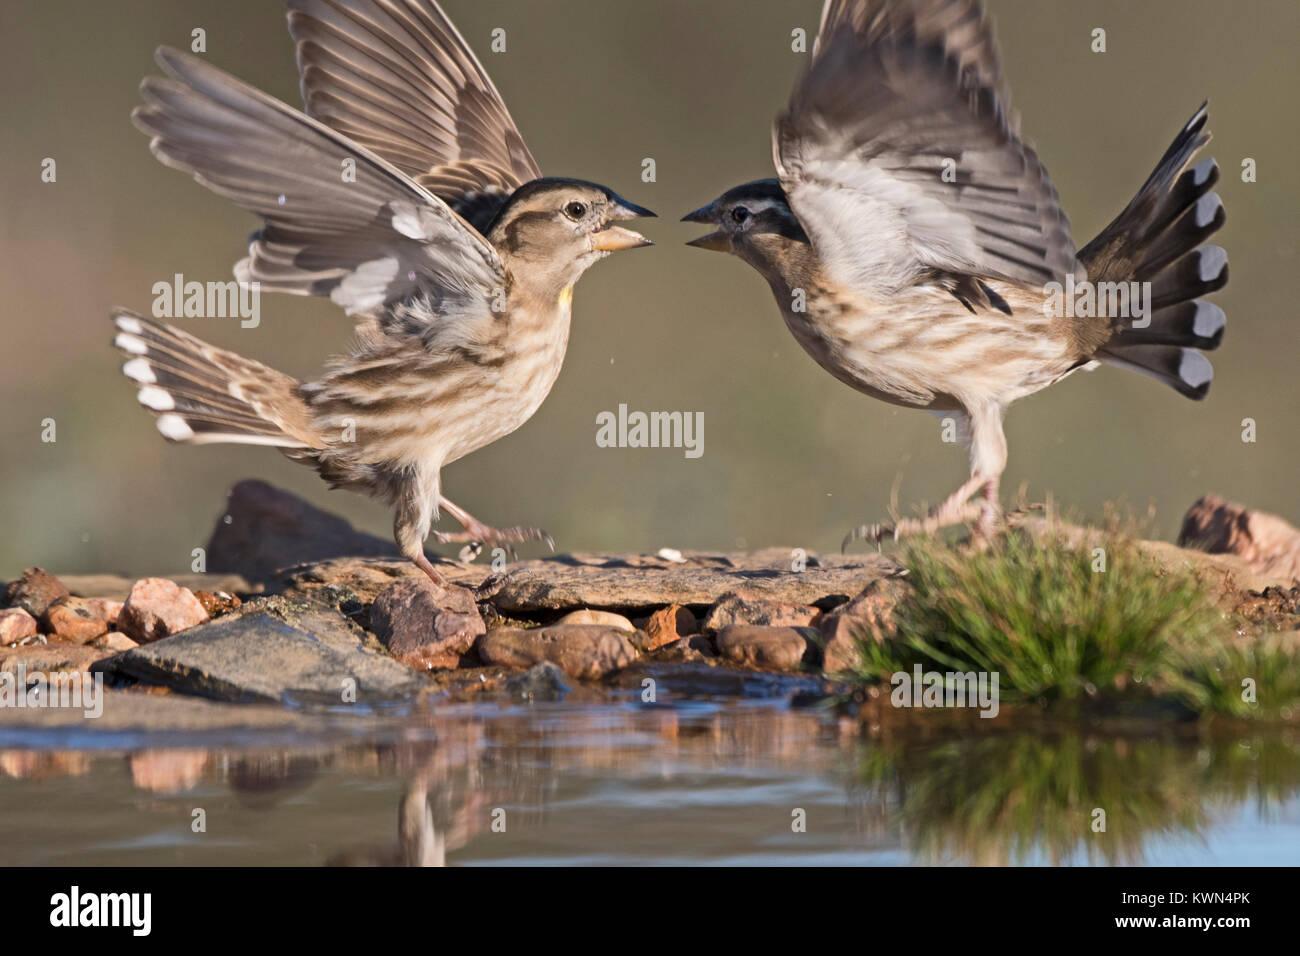 Rock Sparrow Petronia petronia Aggression Extremadura Spanien Dezember Stockbild